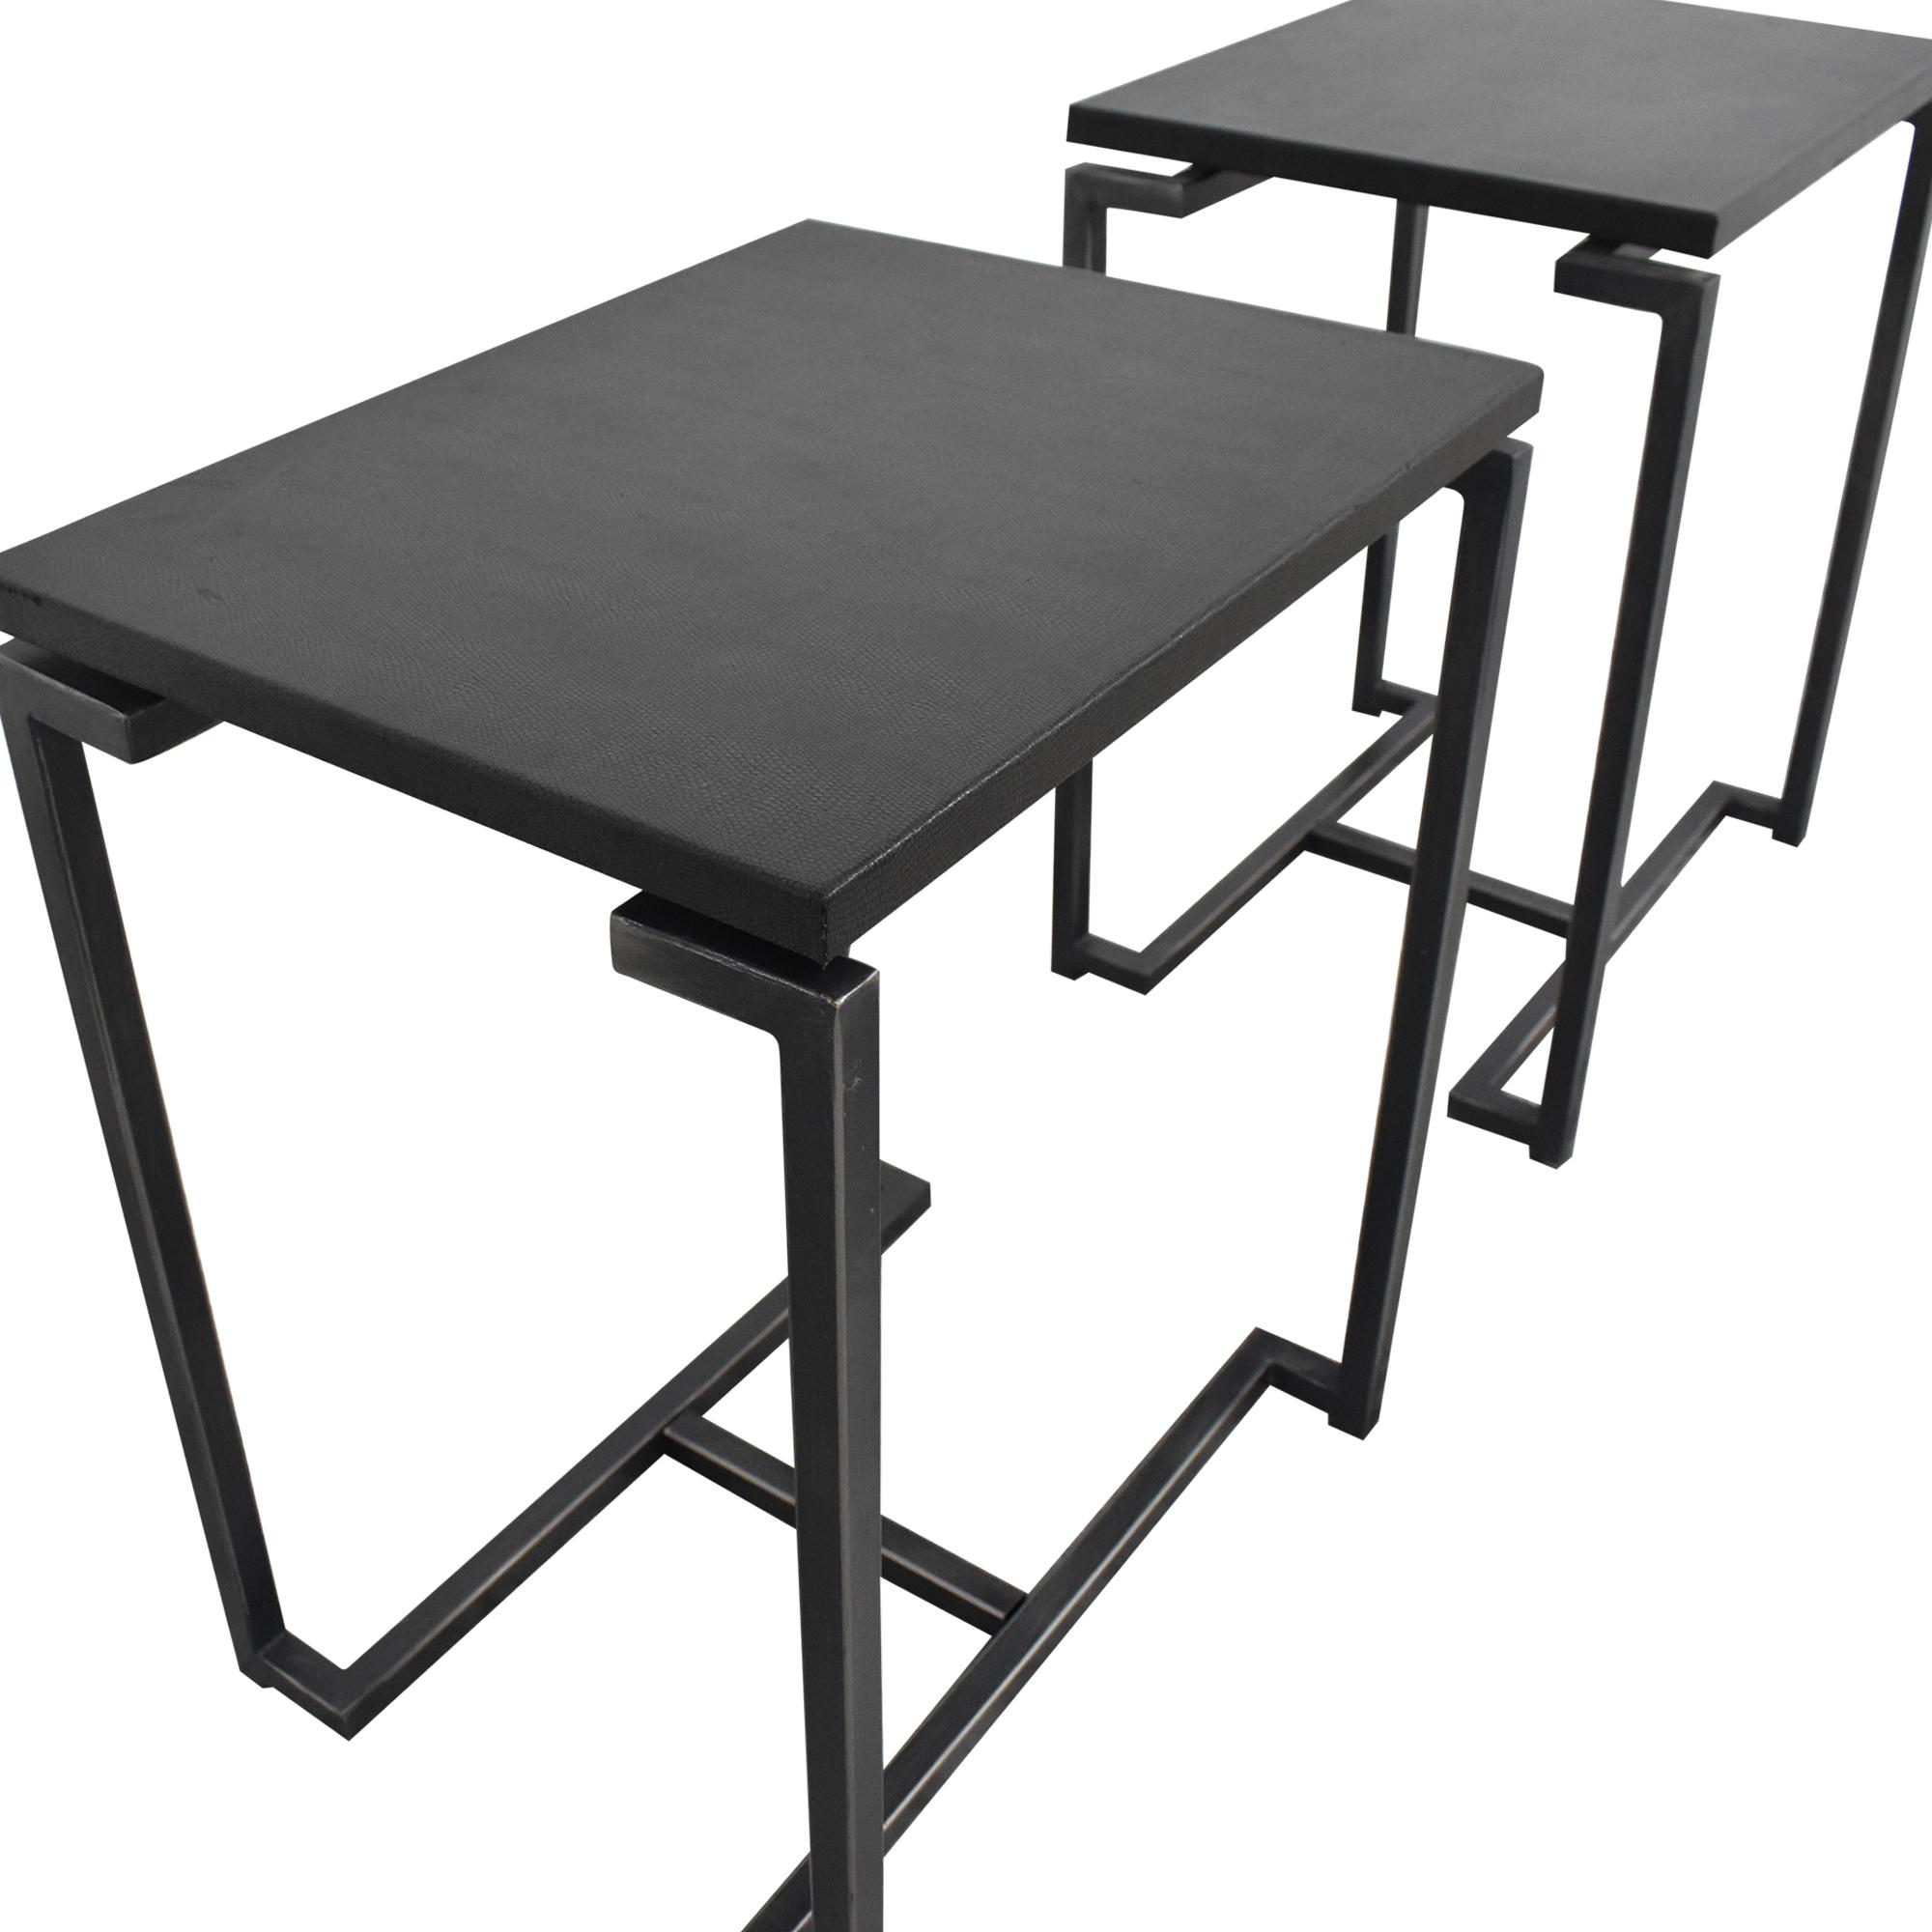 buy West Elm Modern End Tables West Elm Tables